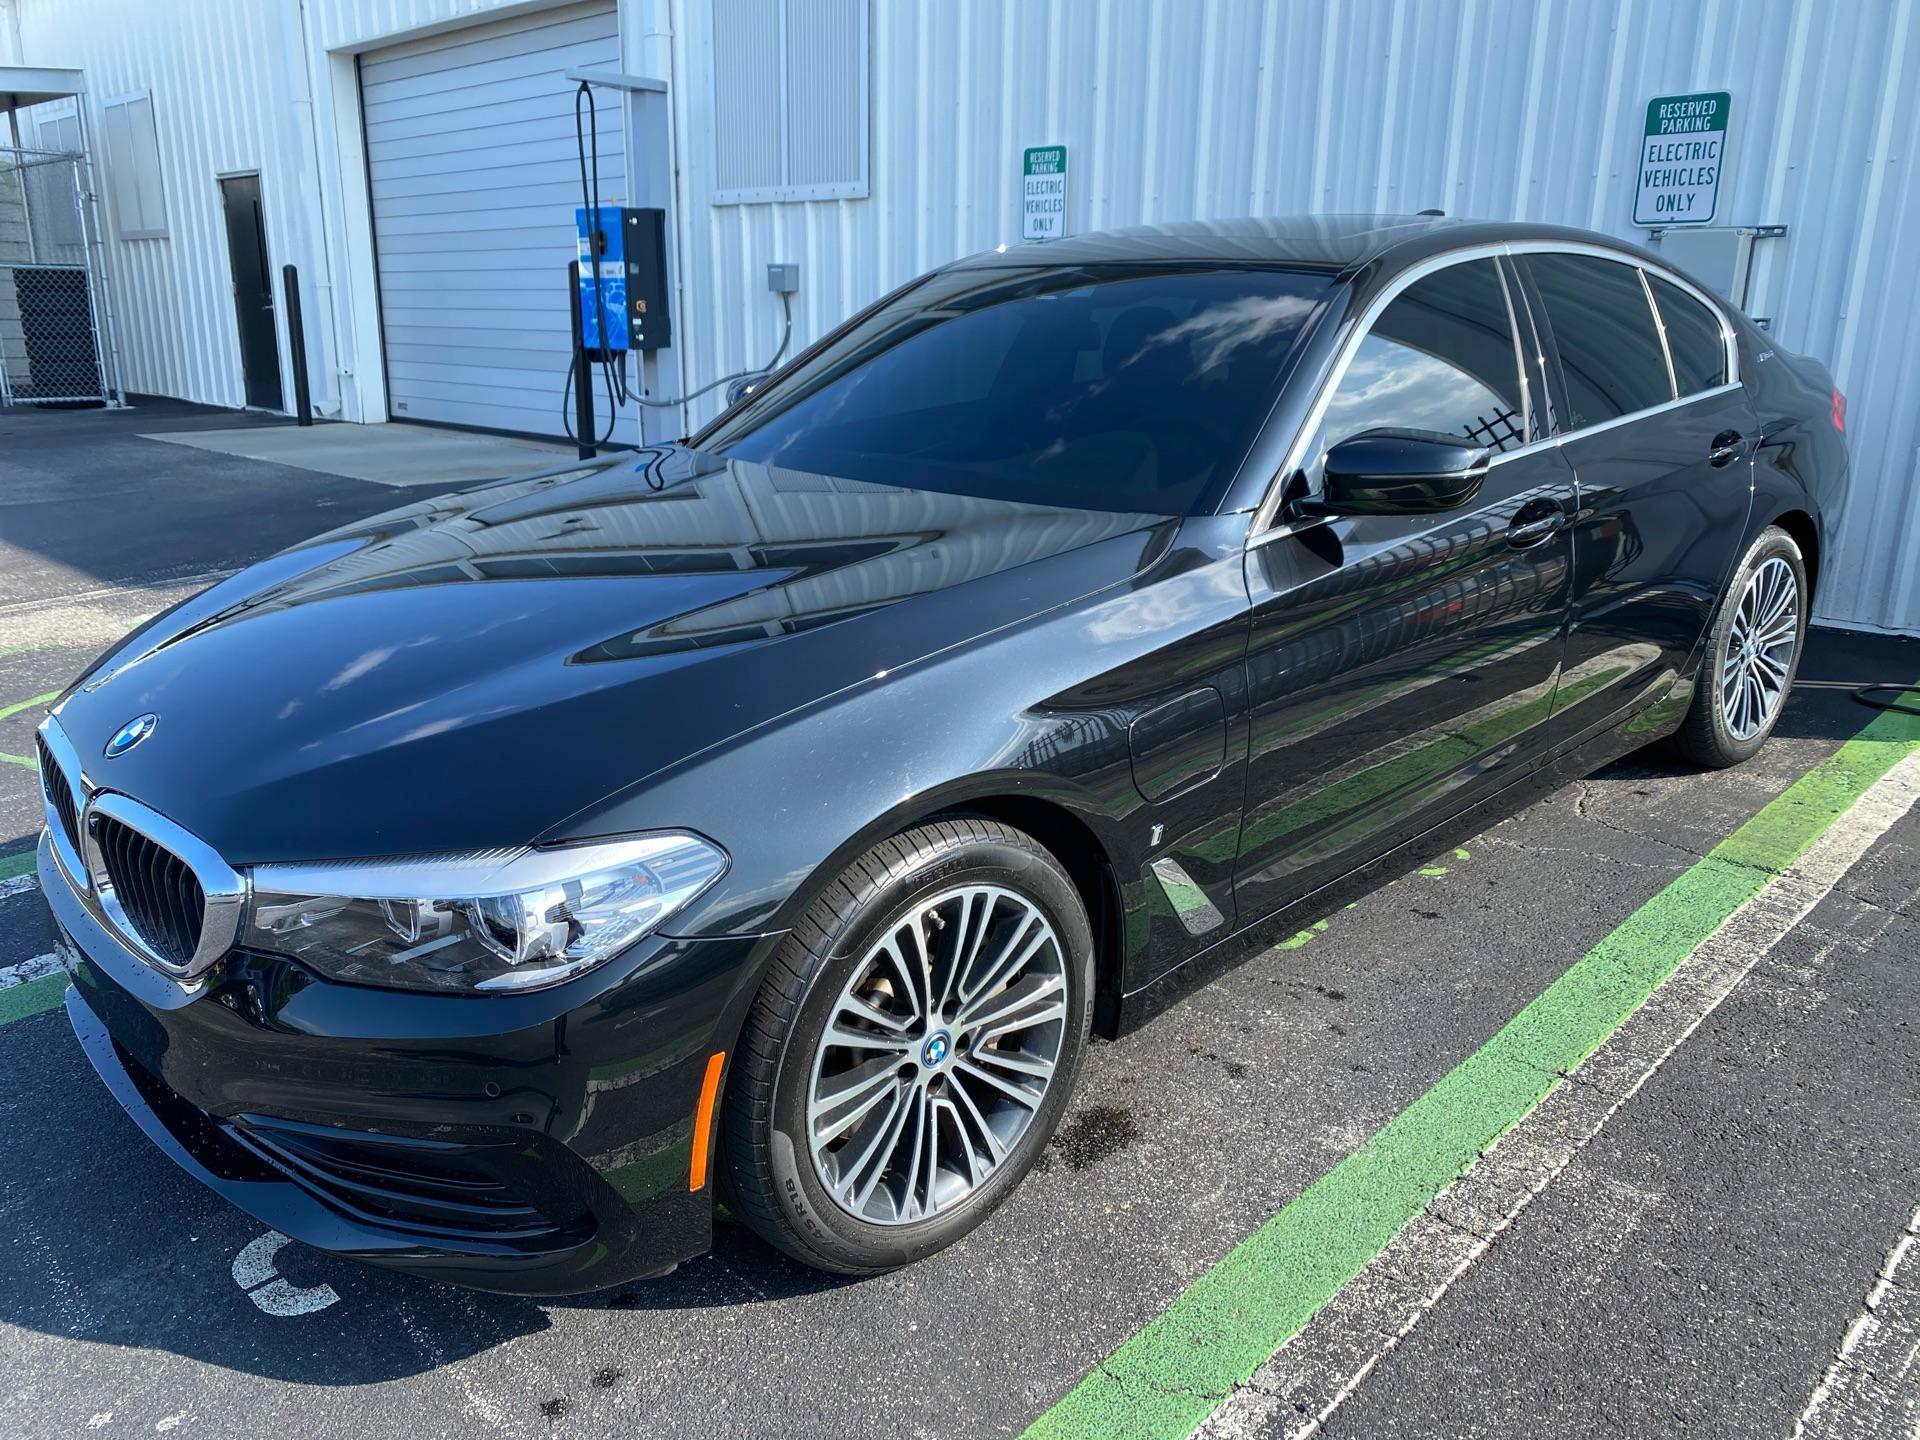 2019 BMW 5 Series - photo 1